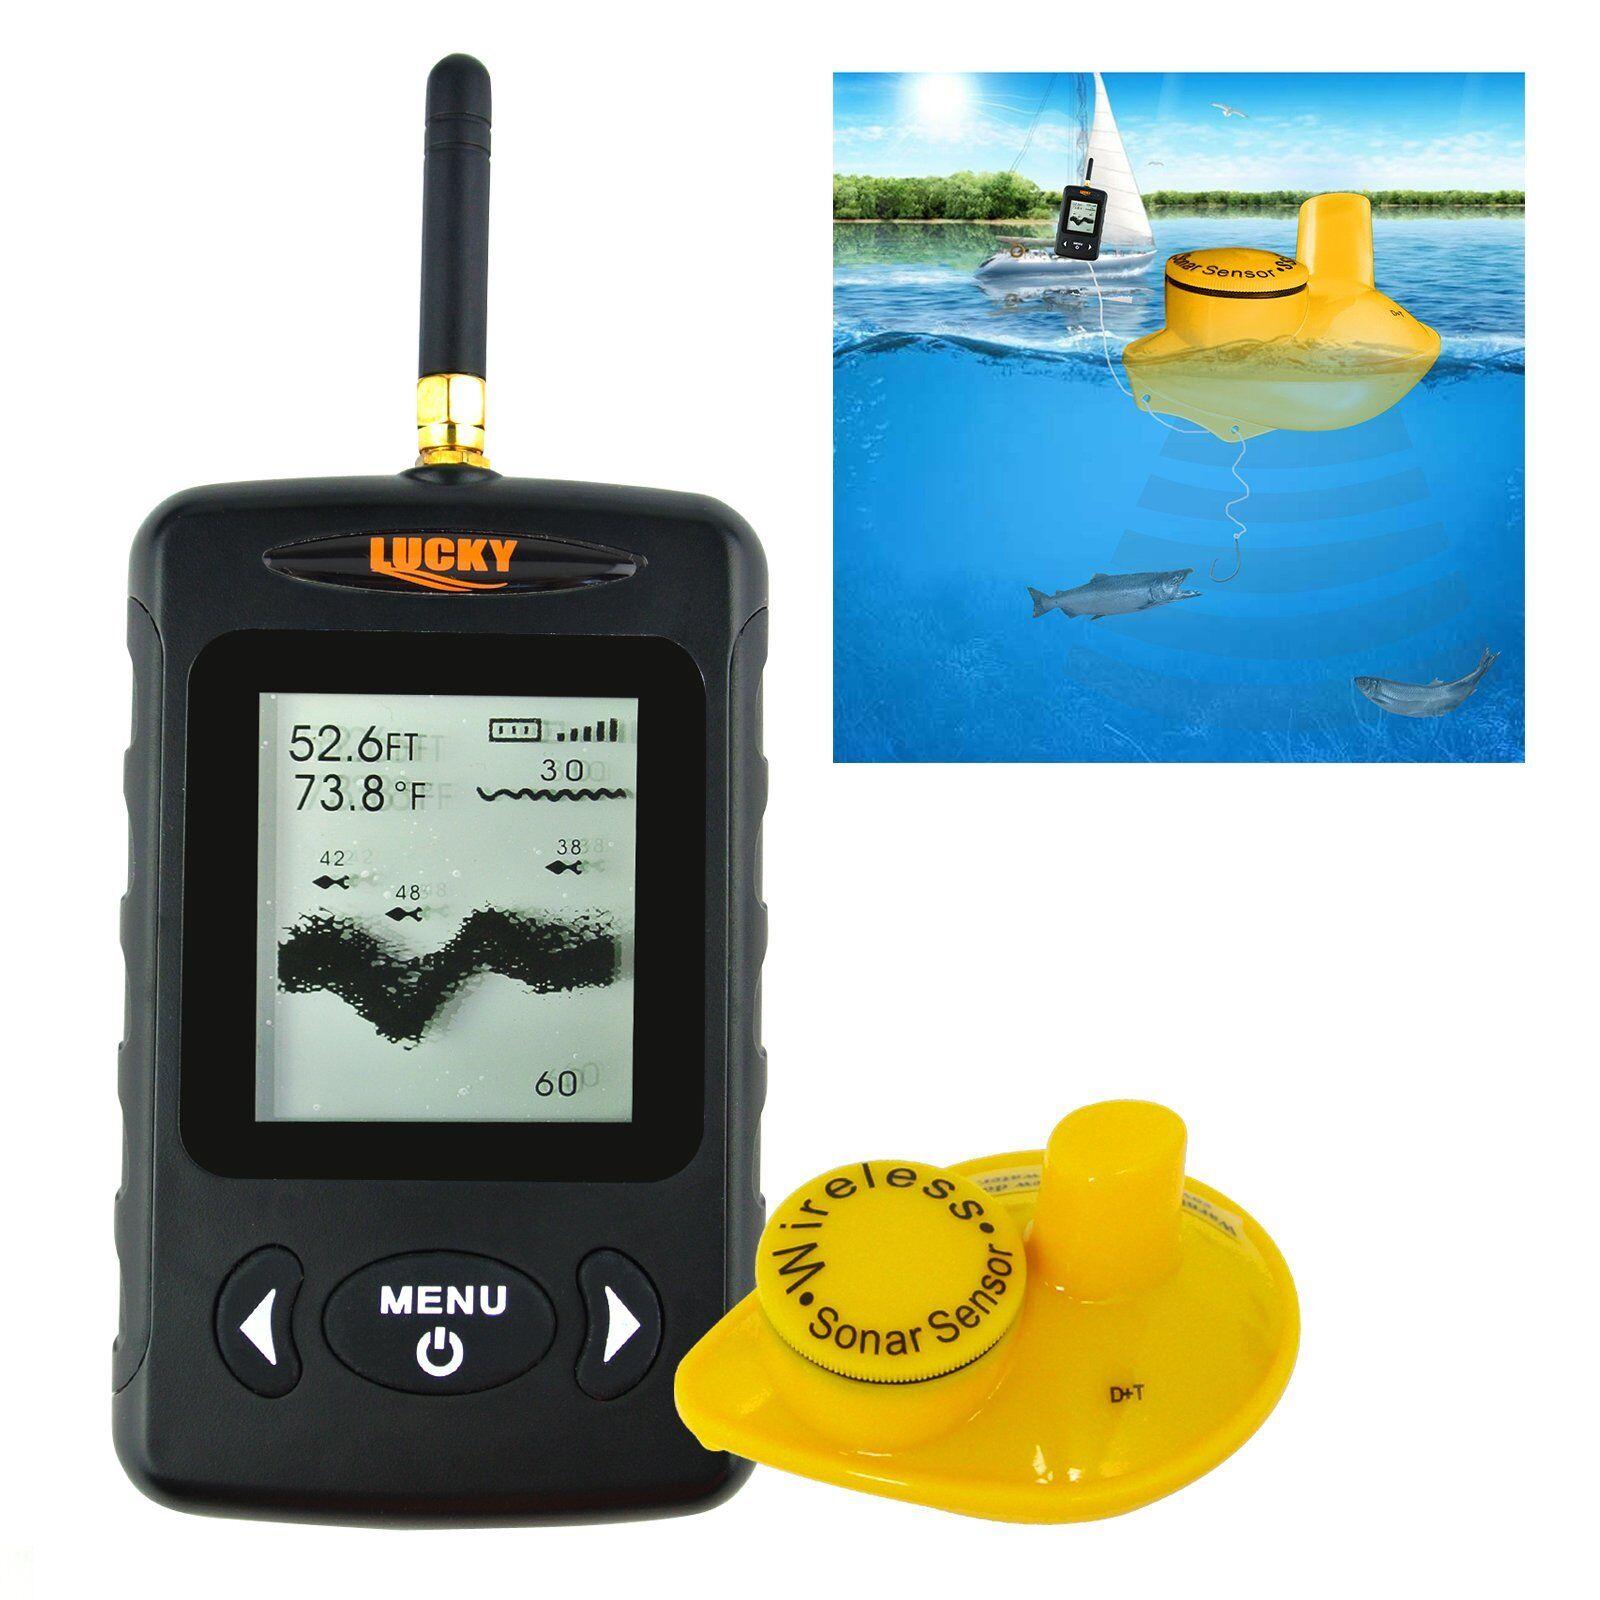 Fish Finder Locator 120m (400ft) Wireless Range 45m (147ft) Depth Range Fishing